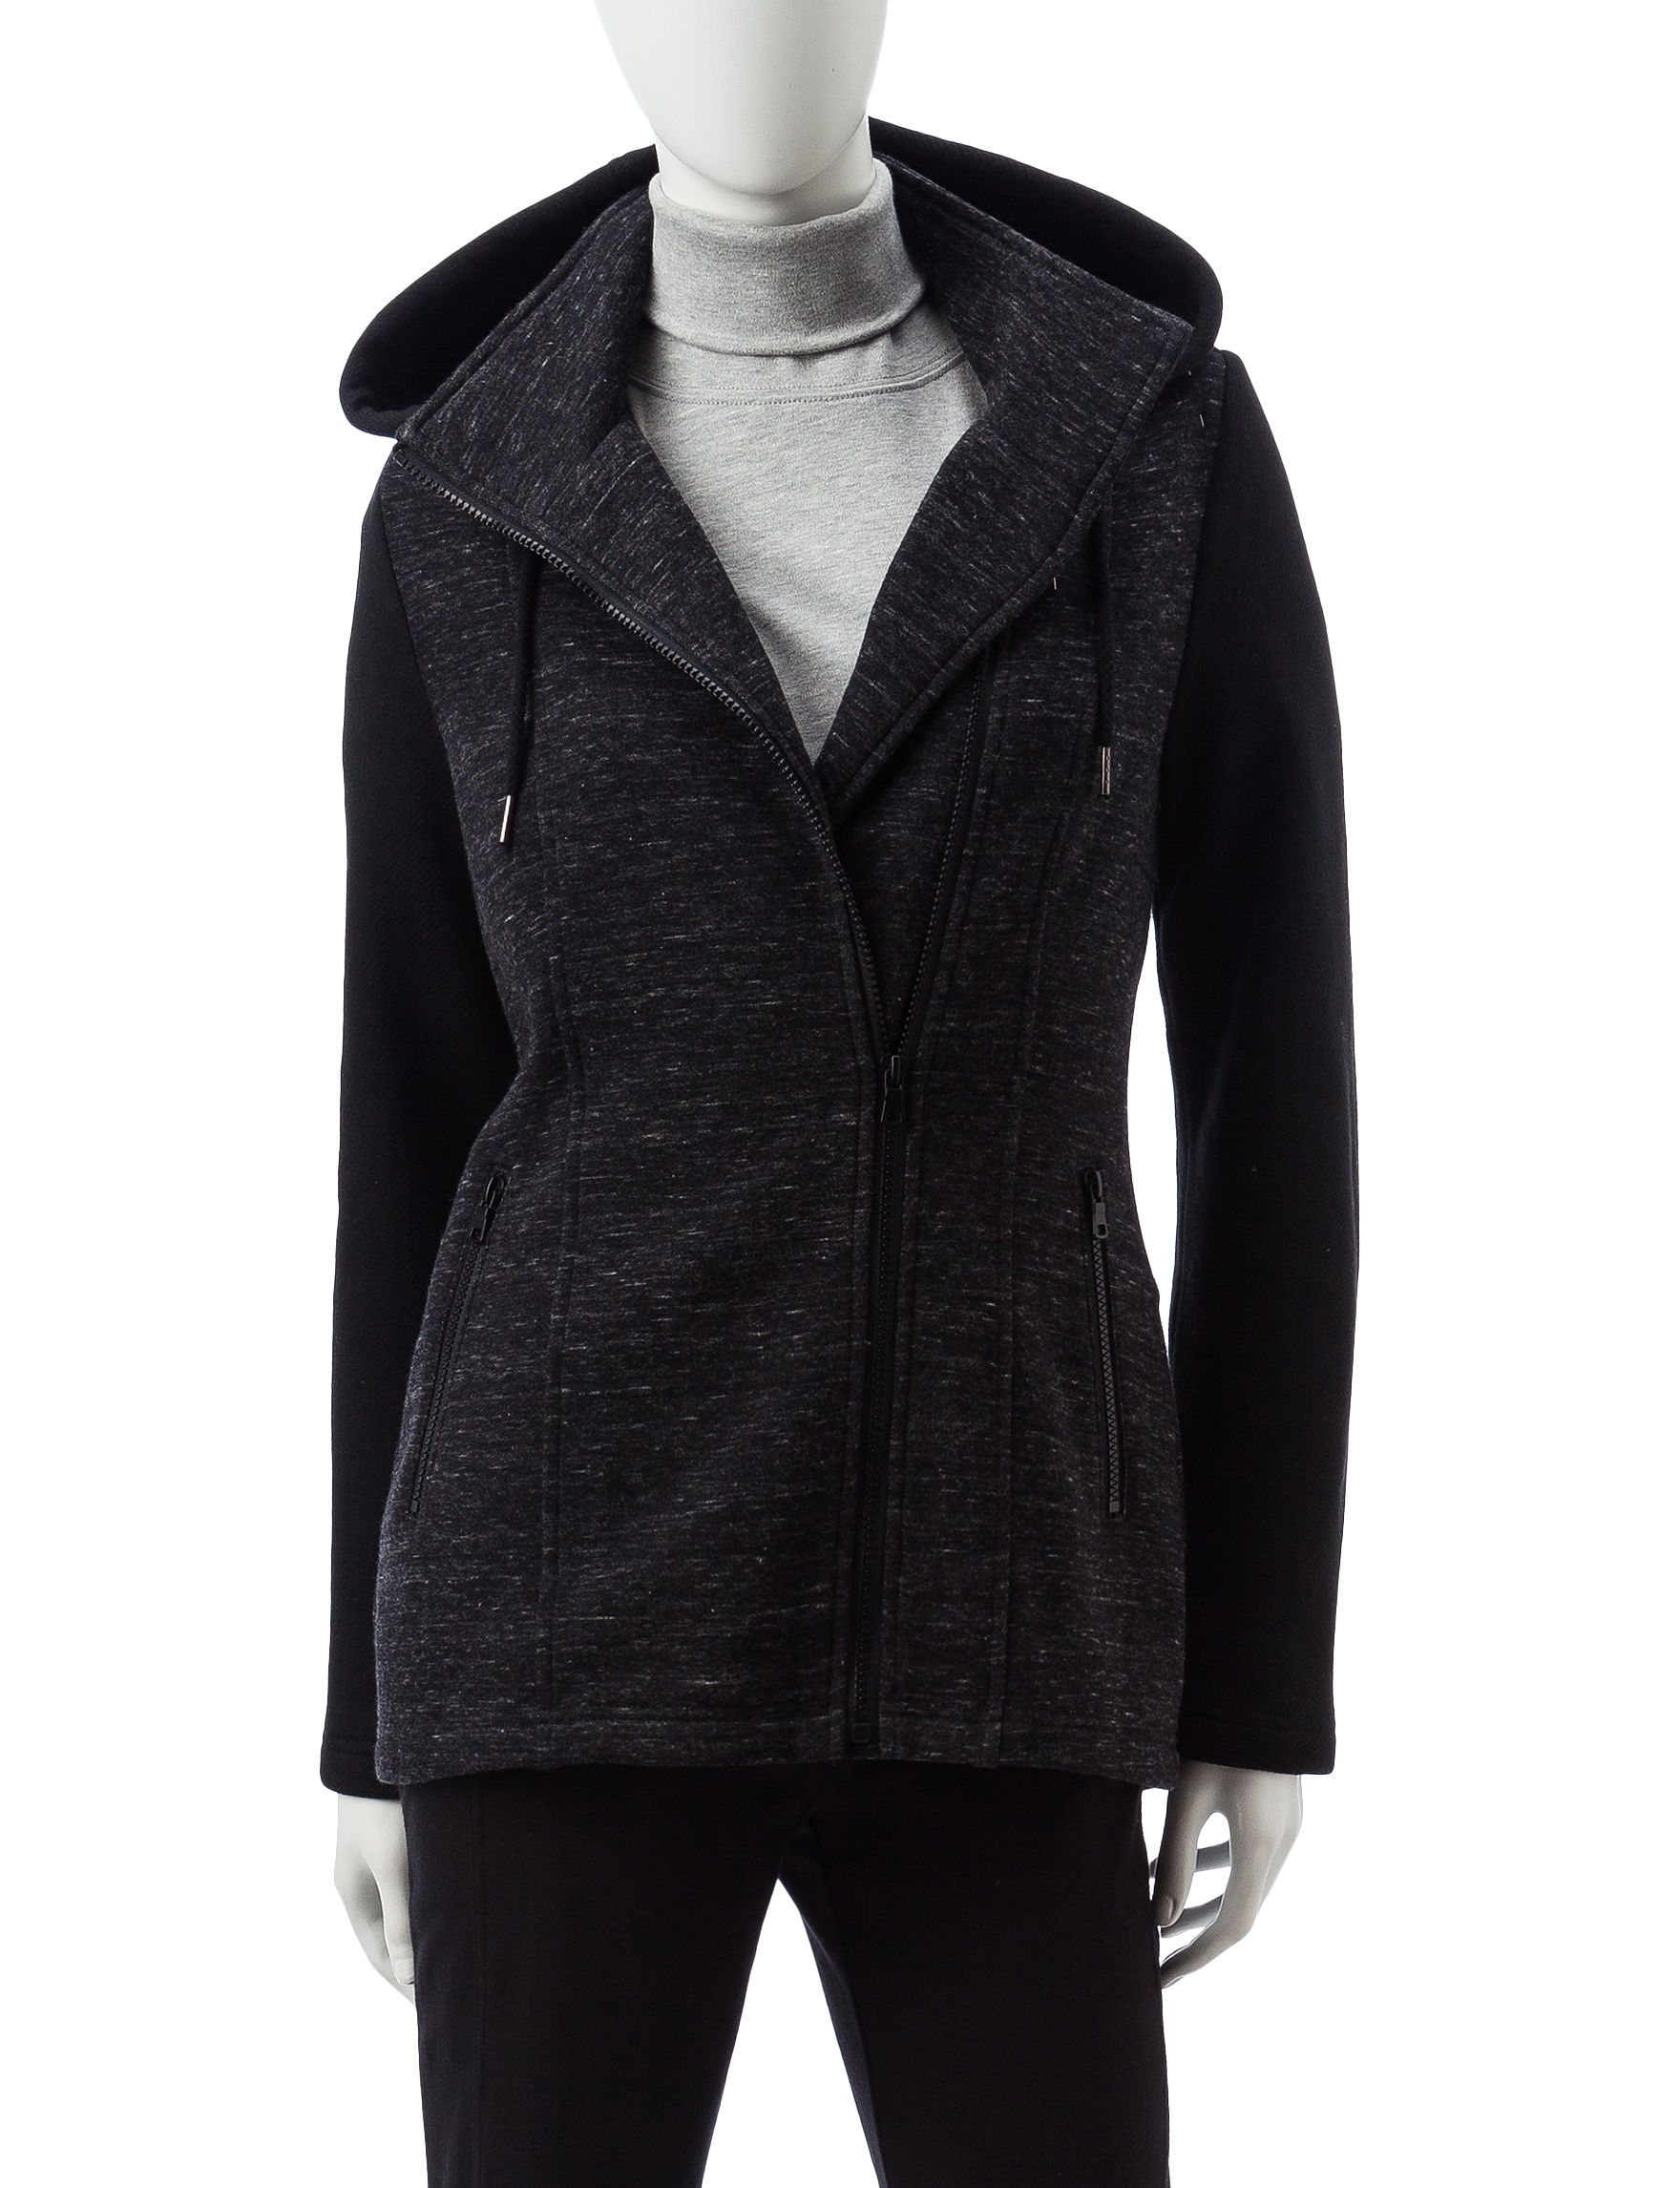 Signature Studio Black Fleece & Soft Shell Jackets